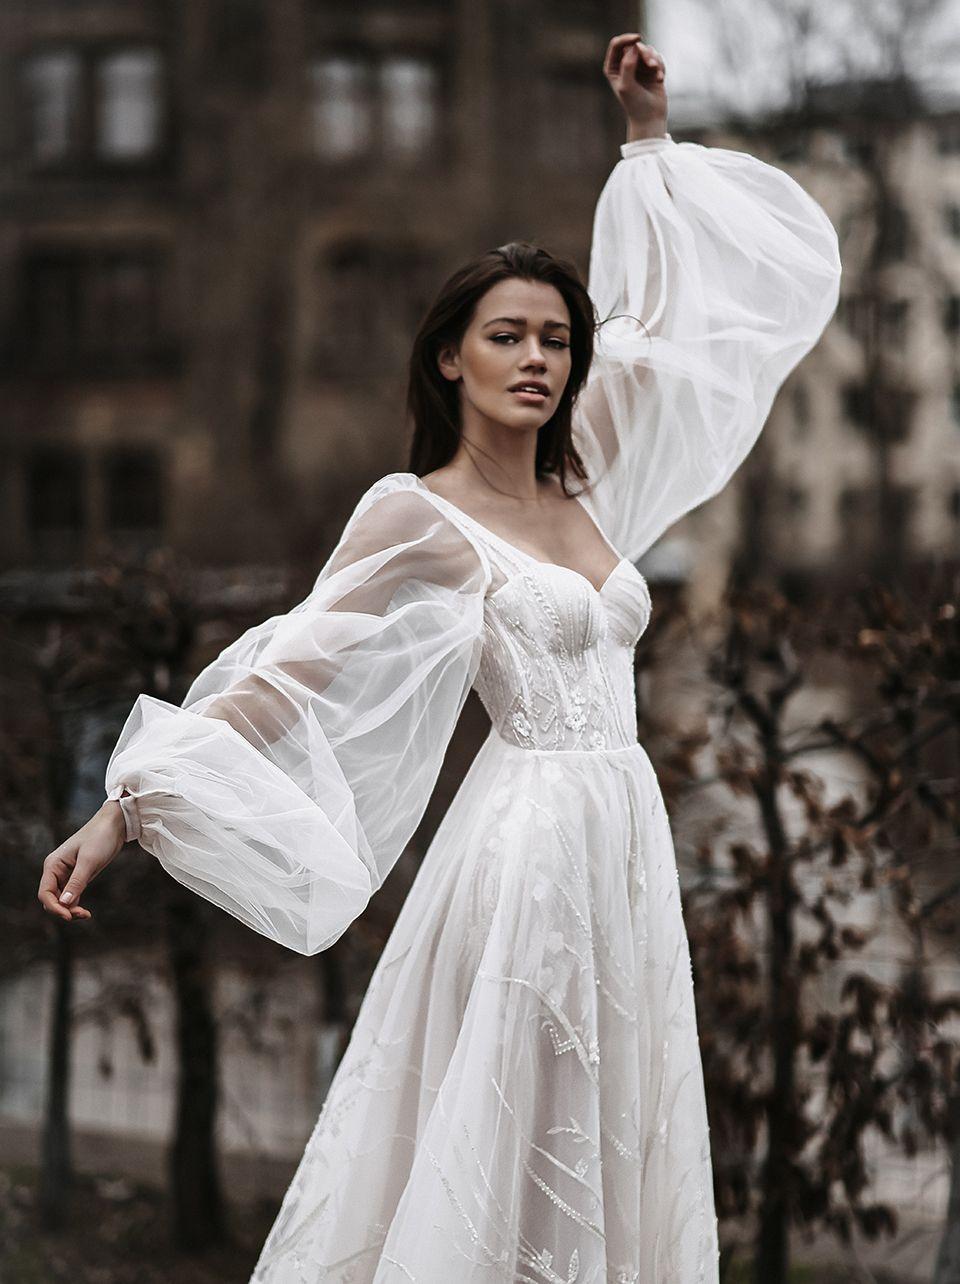 https://www.bridalreflections.com/wp-content/uploads/2021/07/Indie-7.jpg